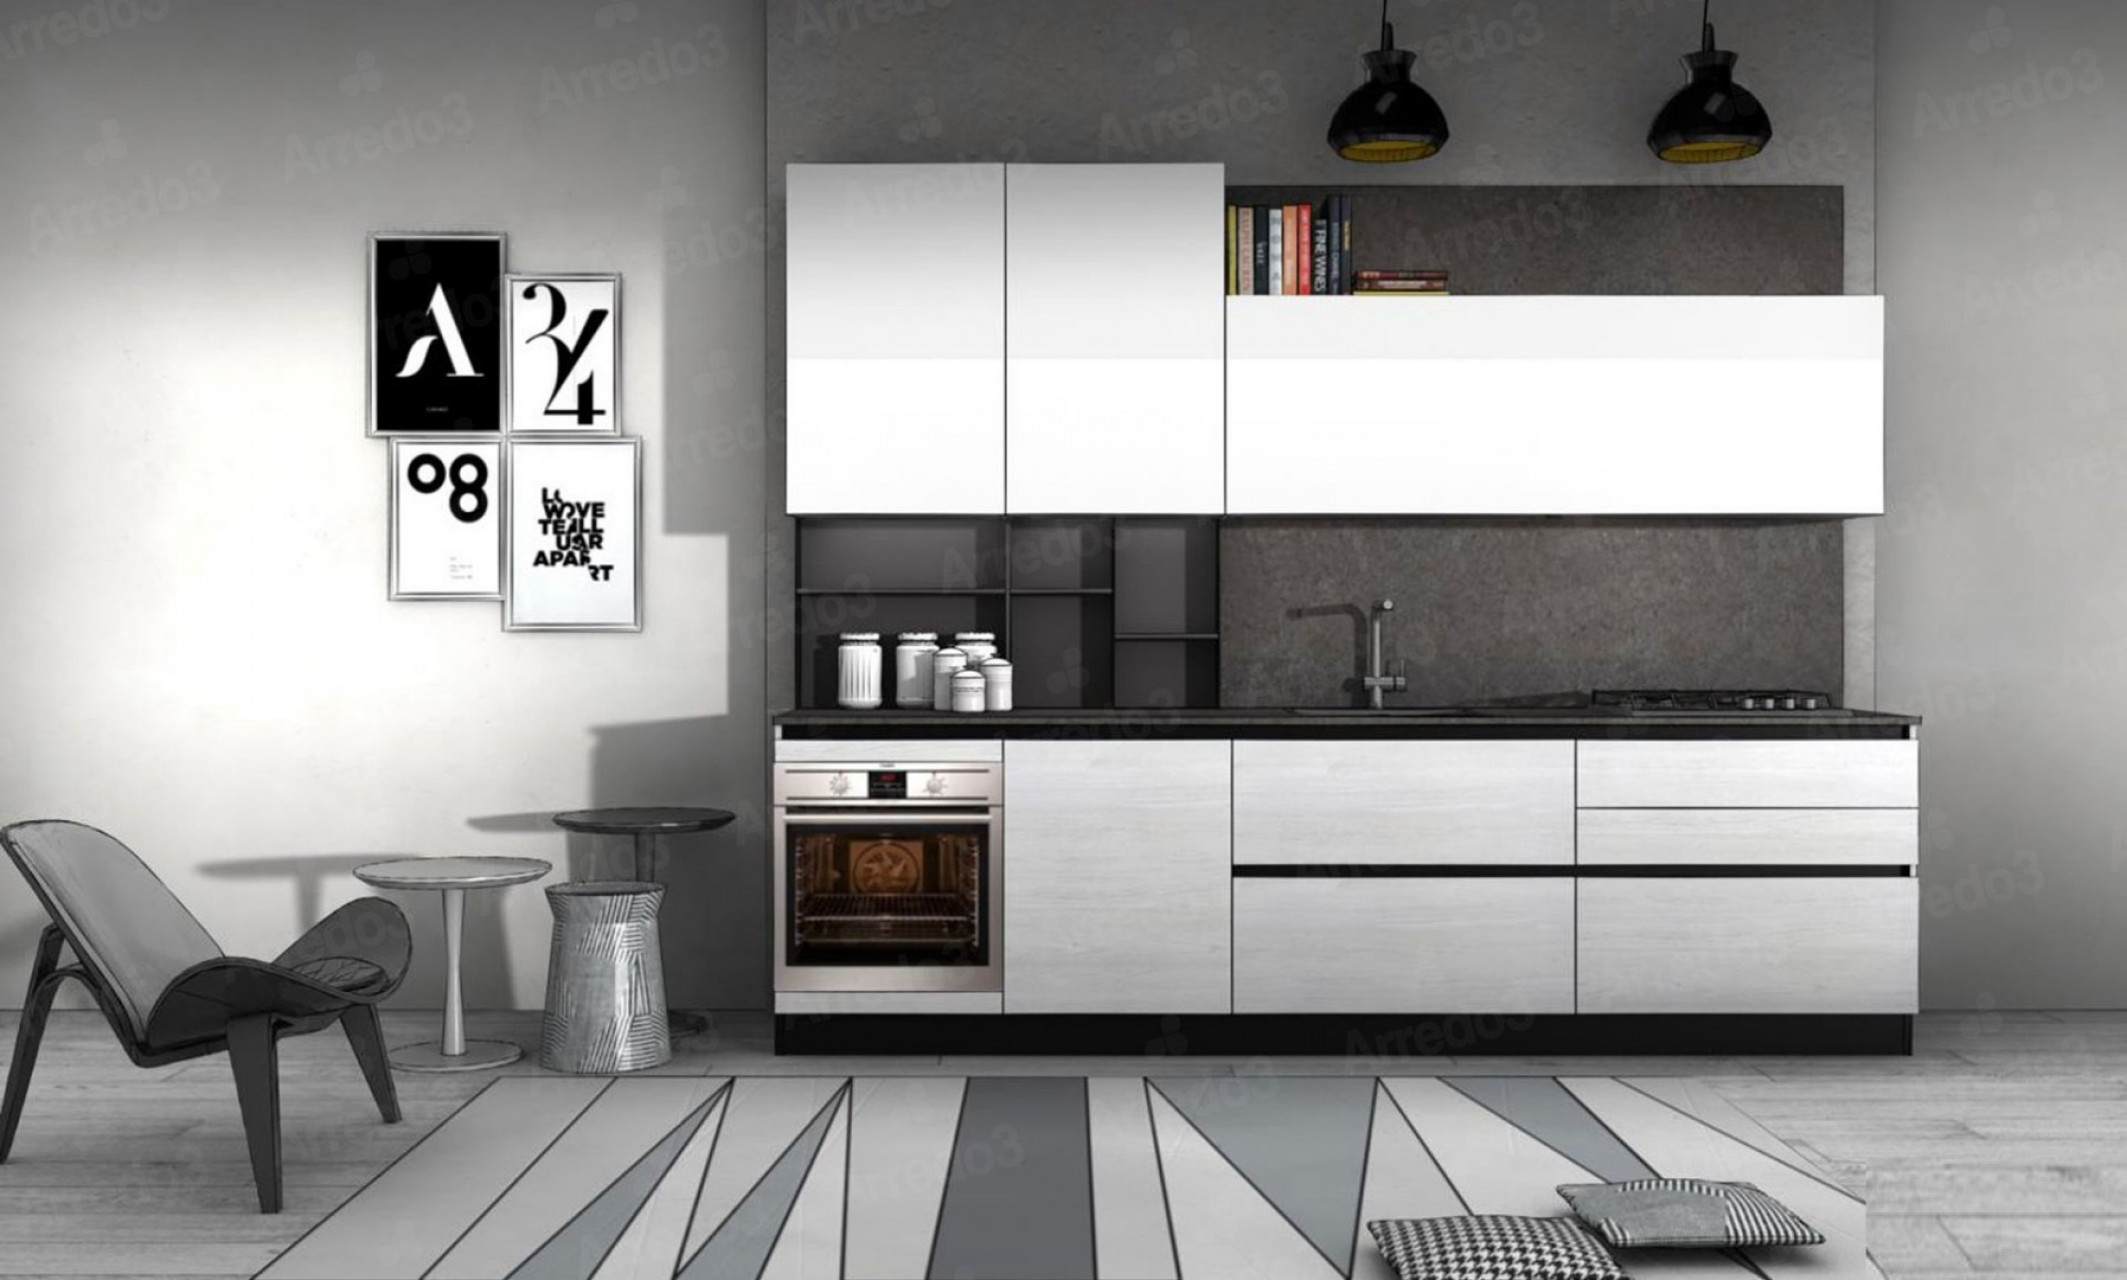 Итальянская КухняCLOE LM26 | Цена на КухняCLOE LM26 ARREDO3